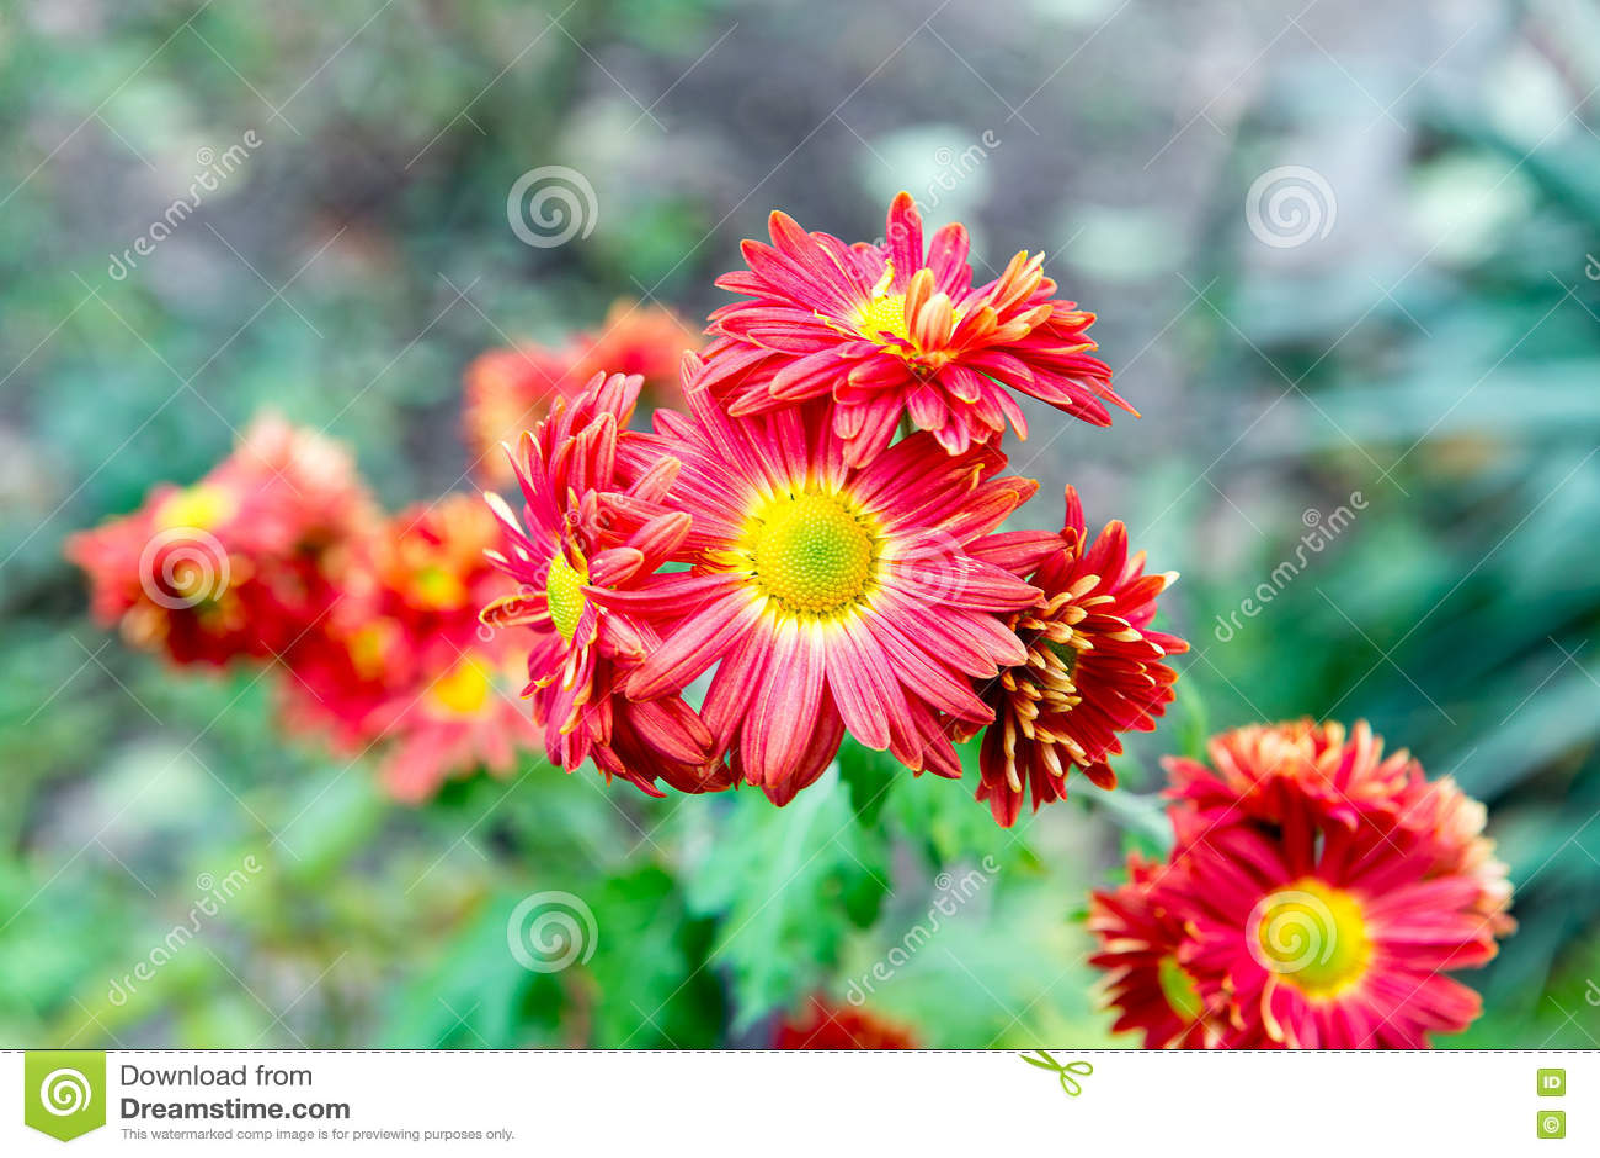 flowers, flowers chrysanthemum, chrysanthemum wallpaper